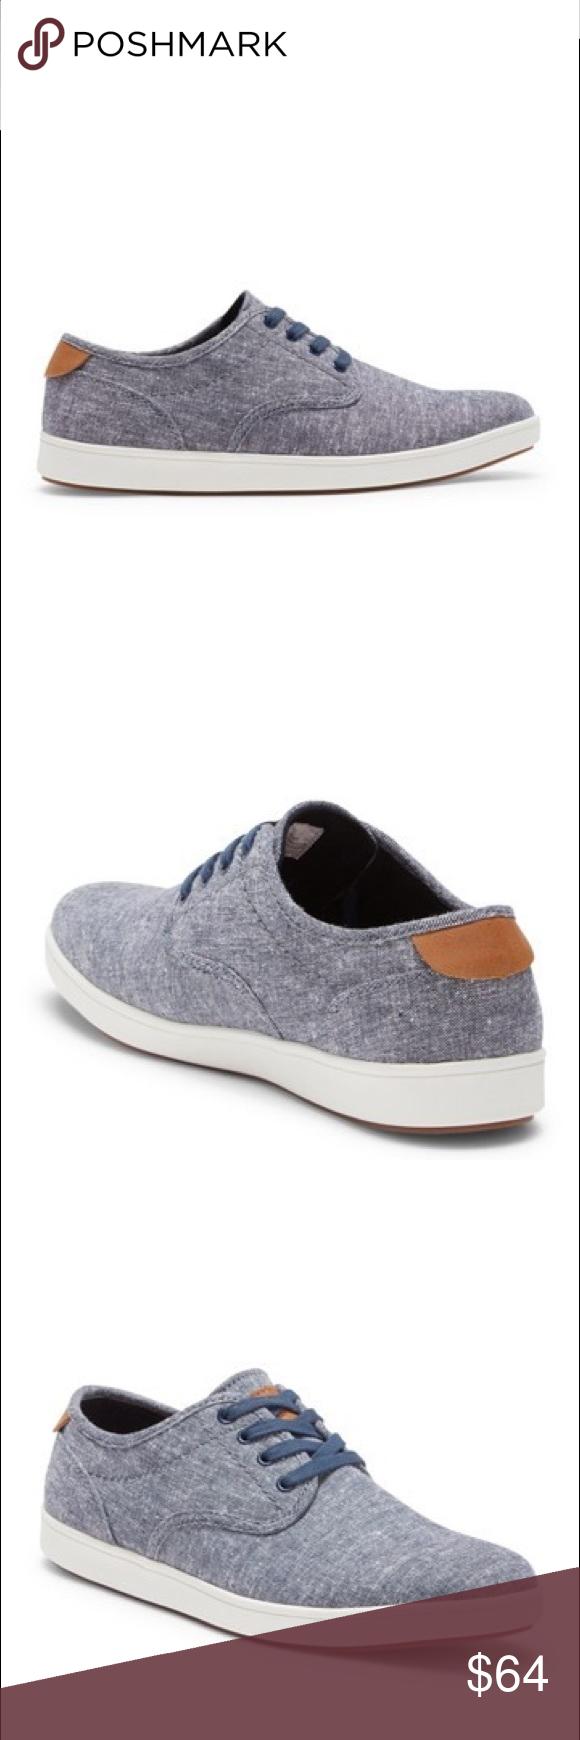 Steve Madden Foxxer Sneaker Size 9 Navy